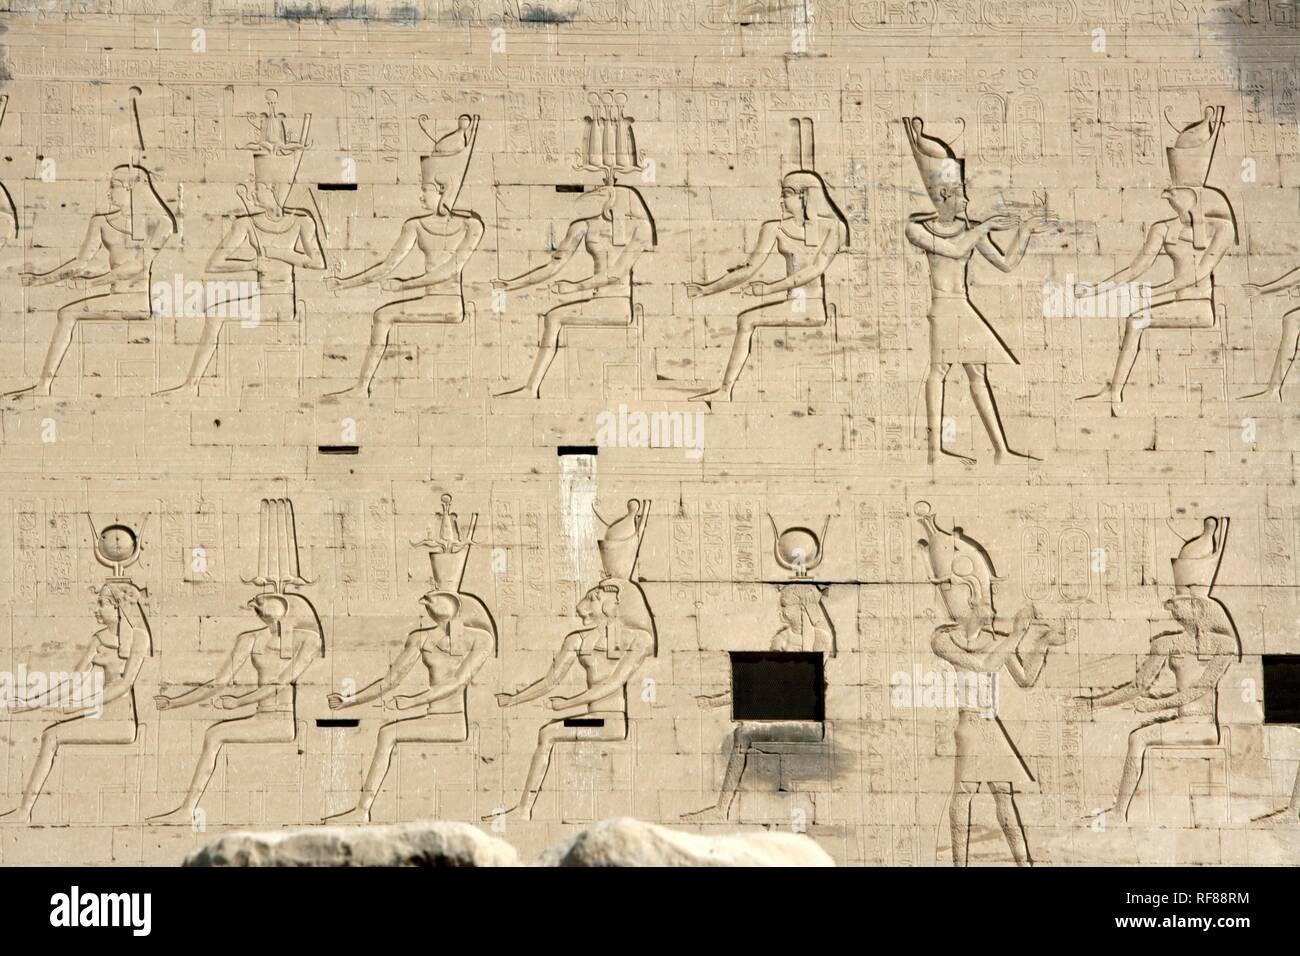 Hieroglyphs, Temple of Edfu (temple dedicated to the falcon god Horus), Edfu, Egypt, Africa Stock Photo